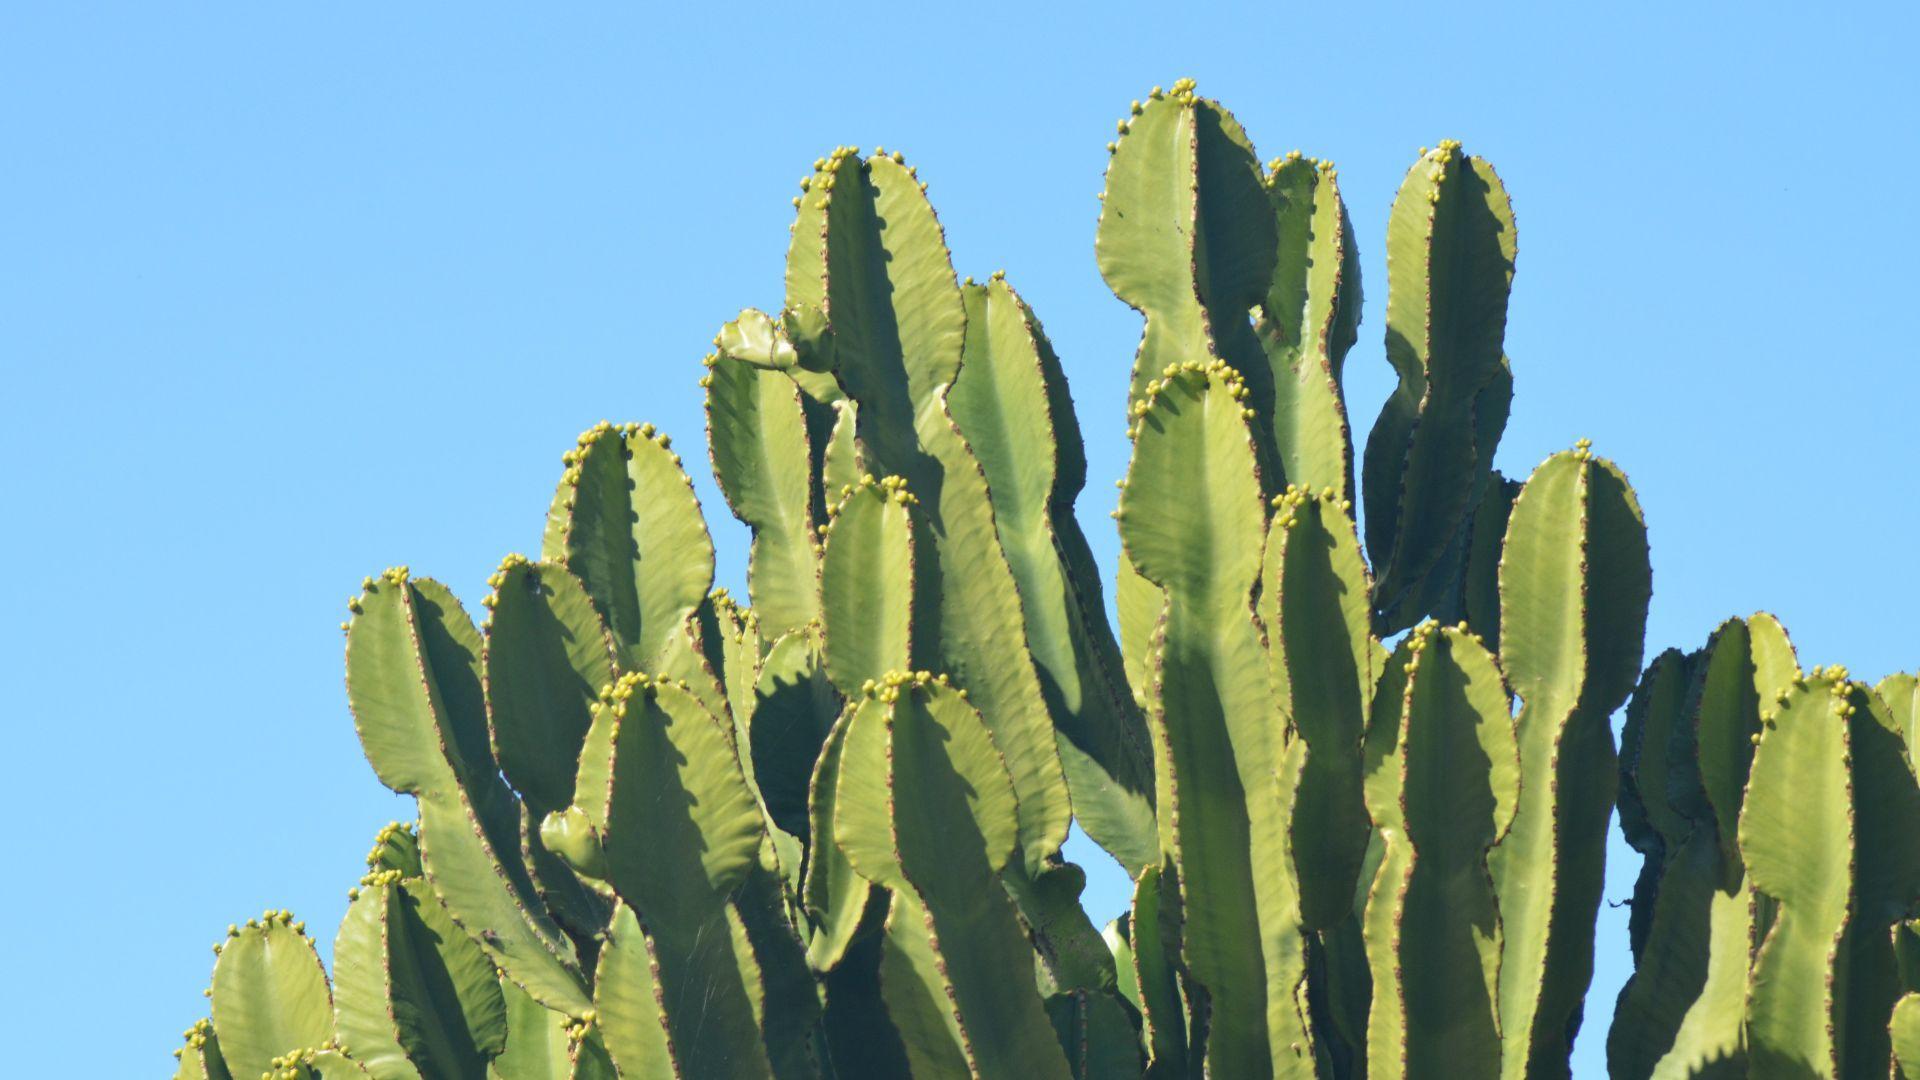 Cactus Nice Wallpaper